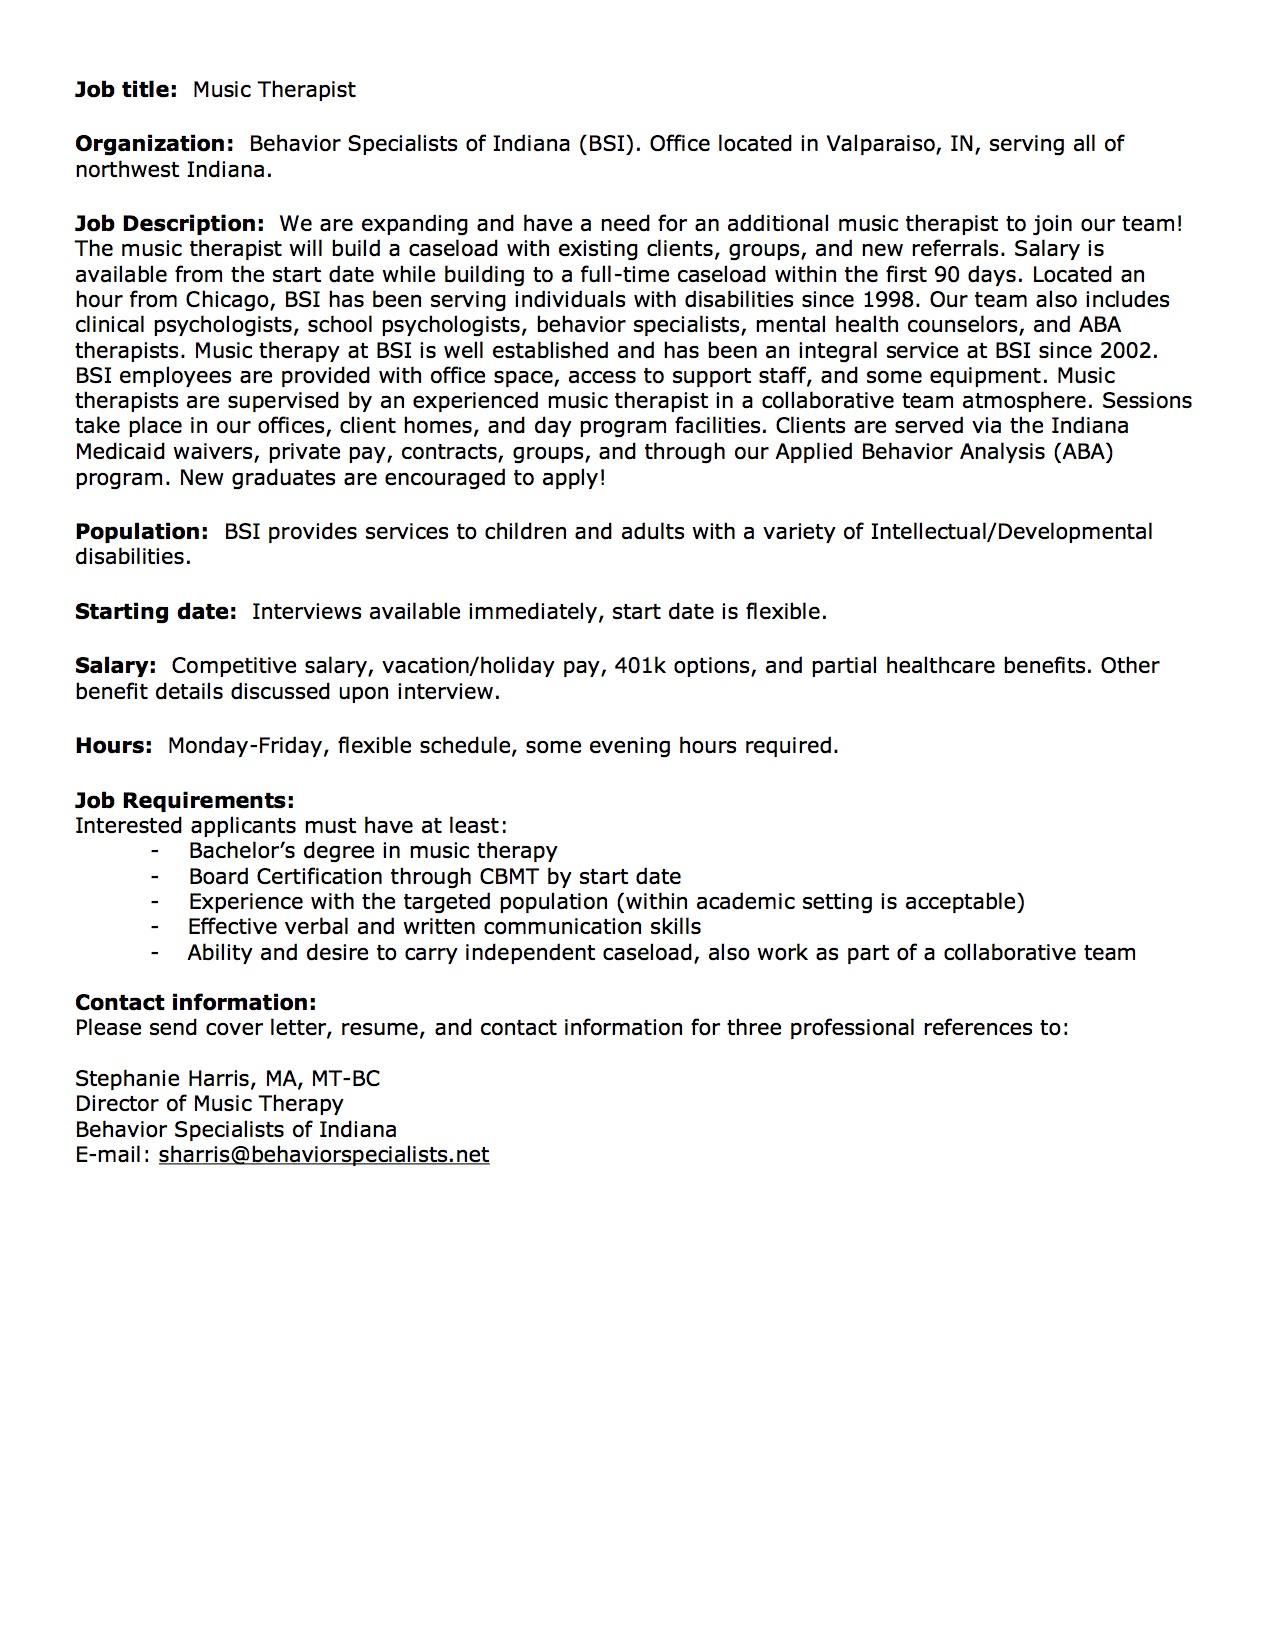 MT Job Posting 4-17